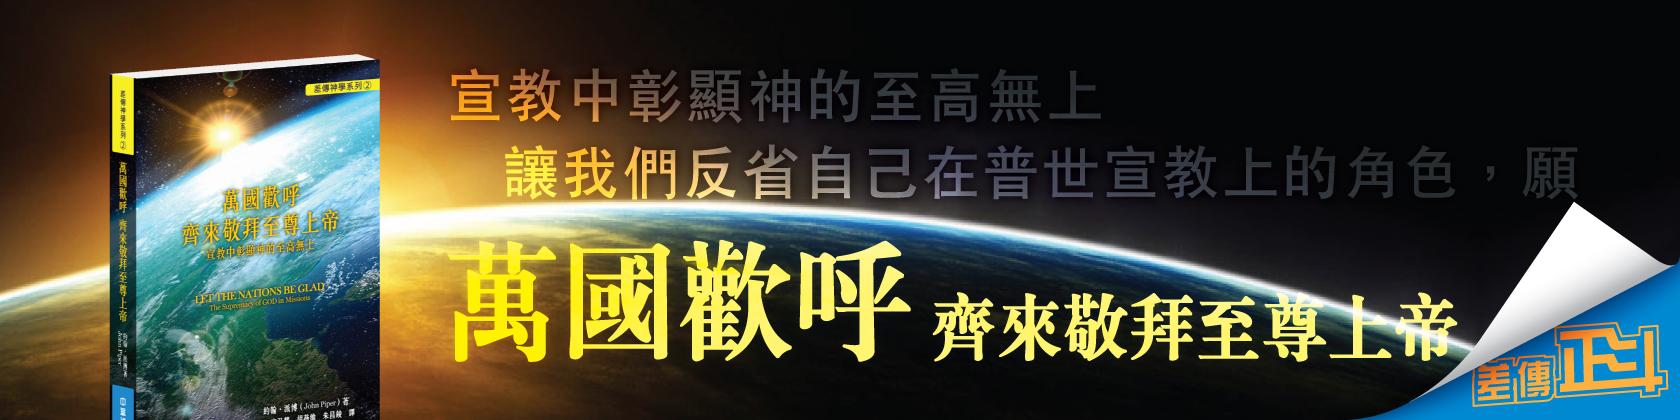 CB-01-web-banner-1680-x-420-B1-02